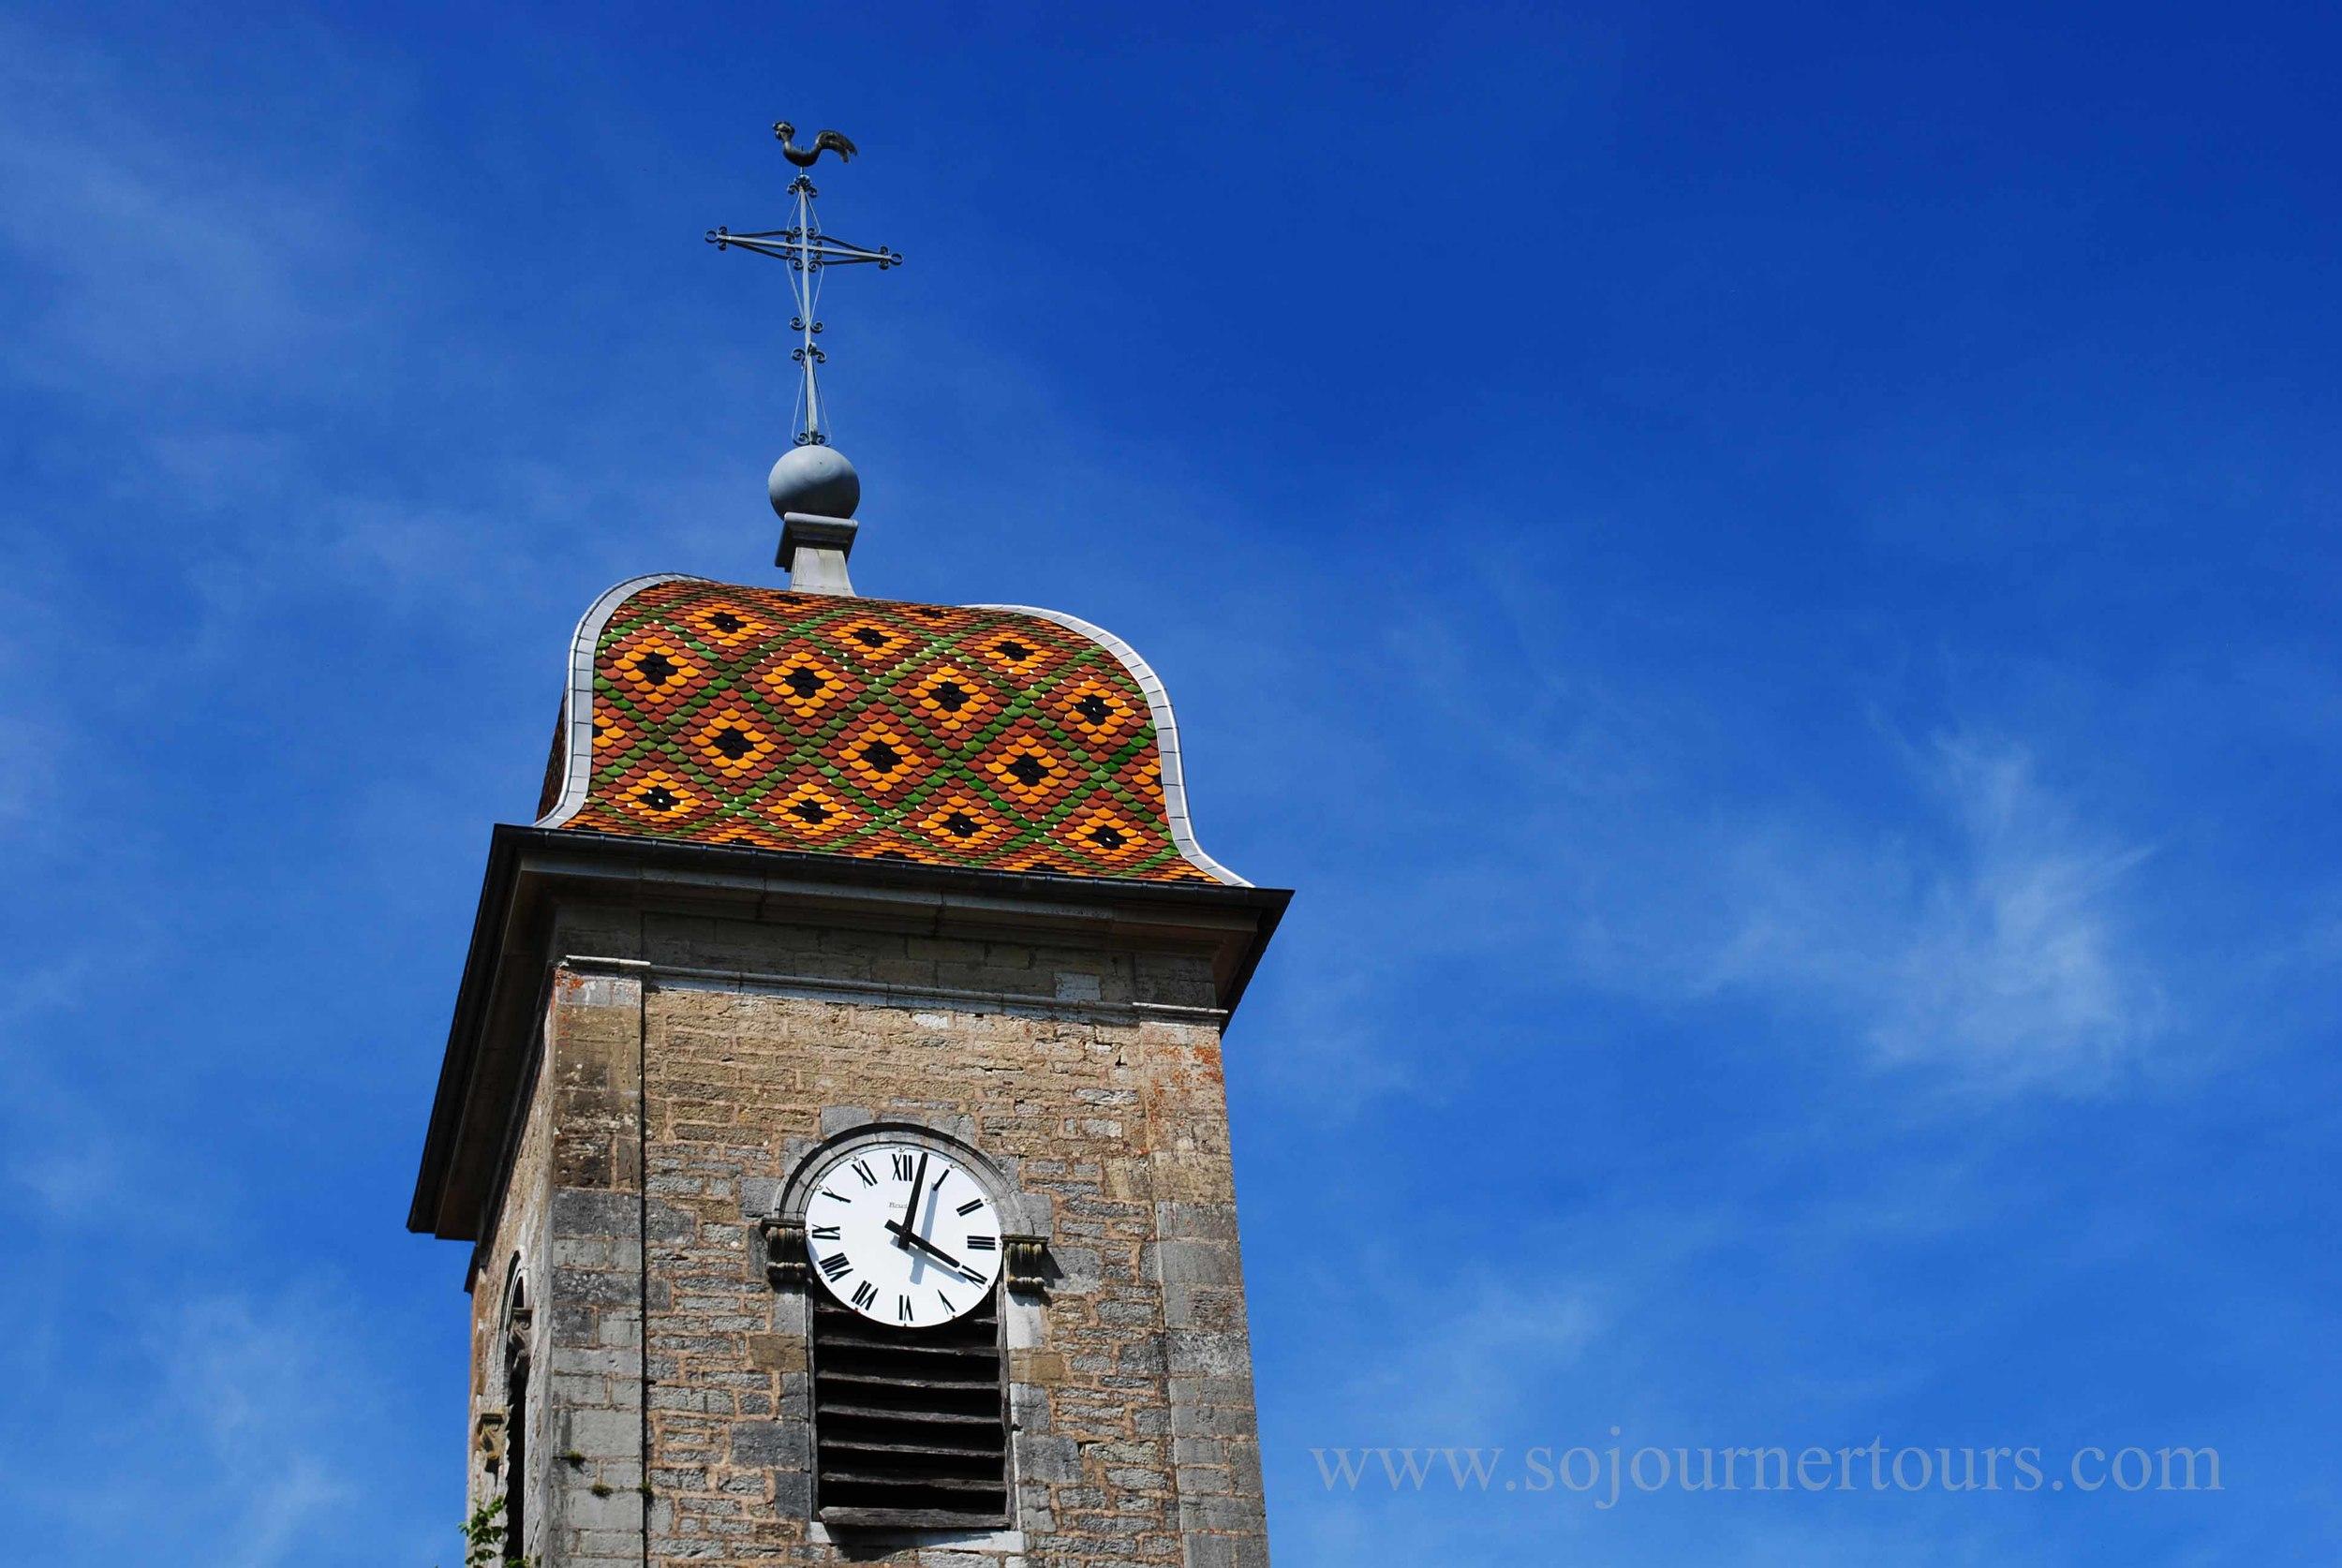 Church Steeple Franche-Comté, France (Sojourner Tours)